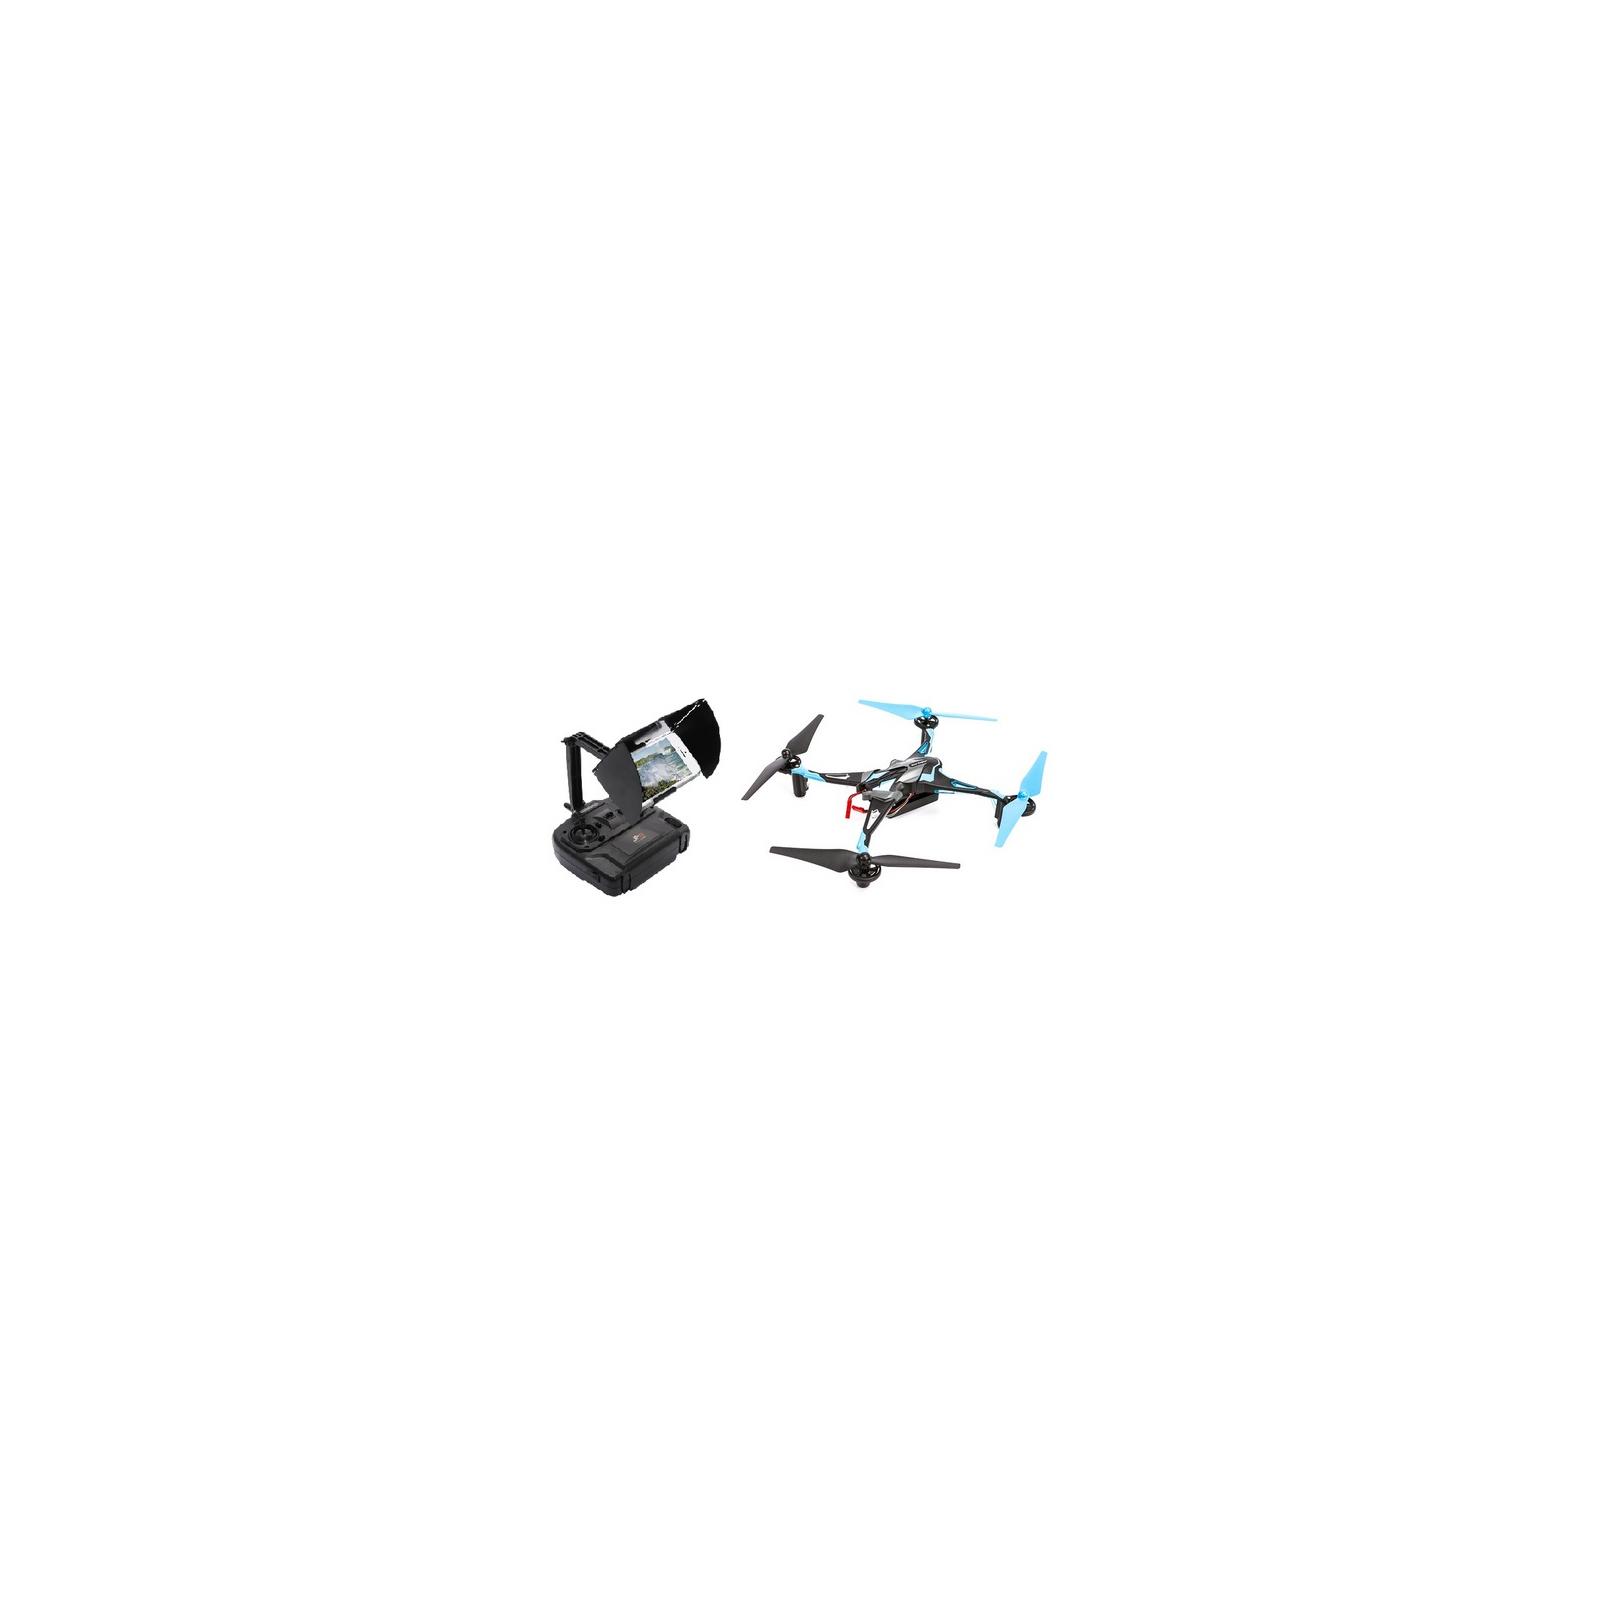 Квадрокоптер Nine Eagles Galaxy Visitor 6 FPV 4CH с Wi-Fi камерой бирюзовый (NE201884) изображение 5